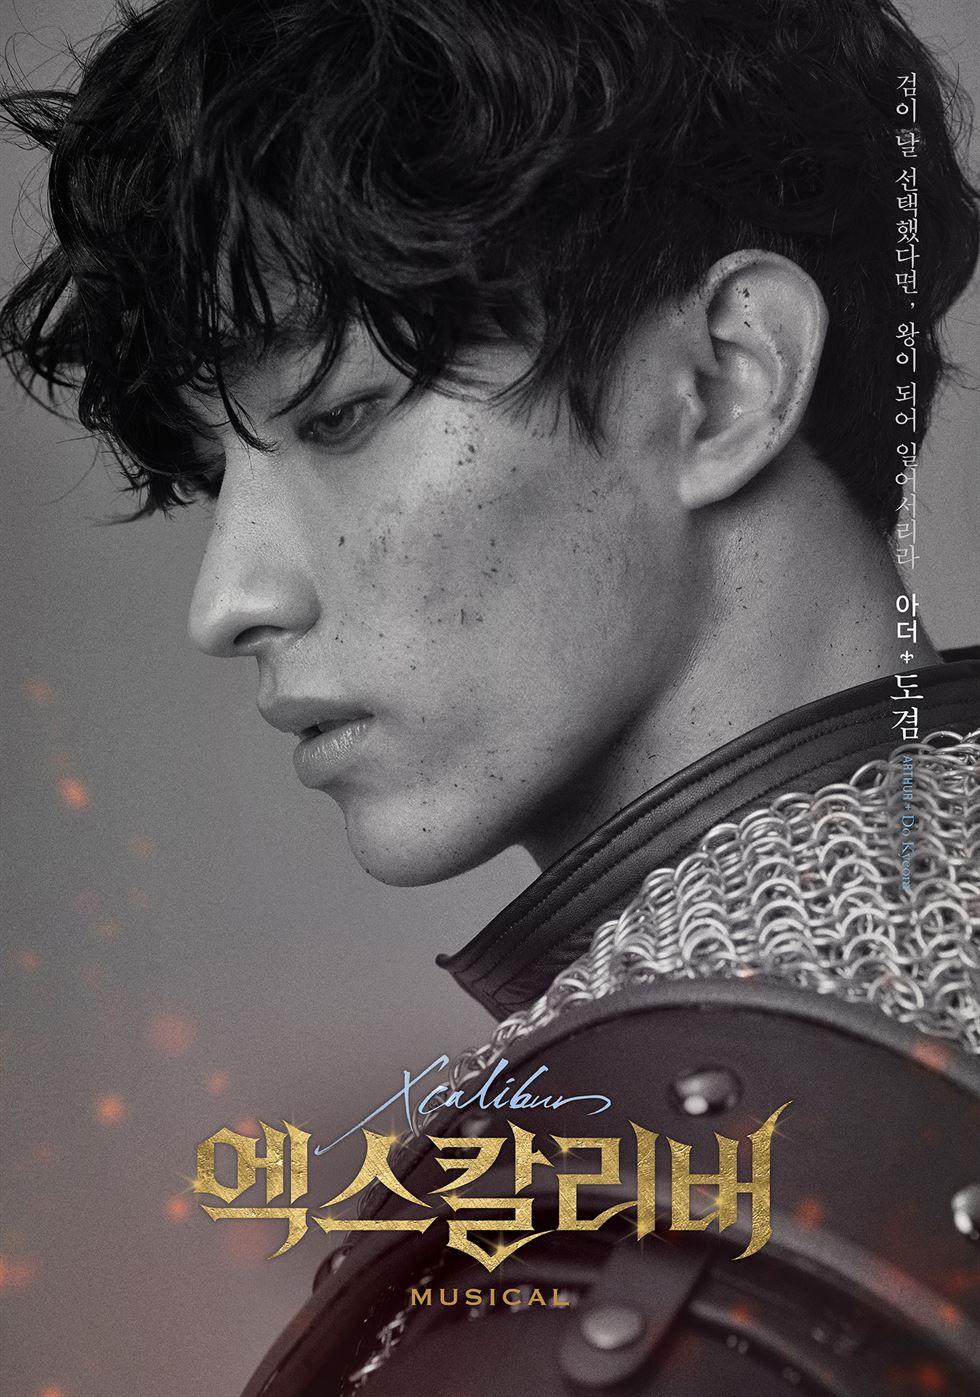 kpop idol dokyeom xcalibur king arthur poster